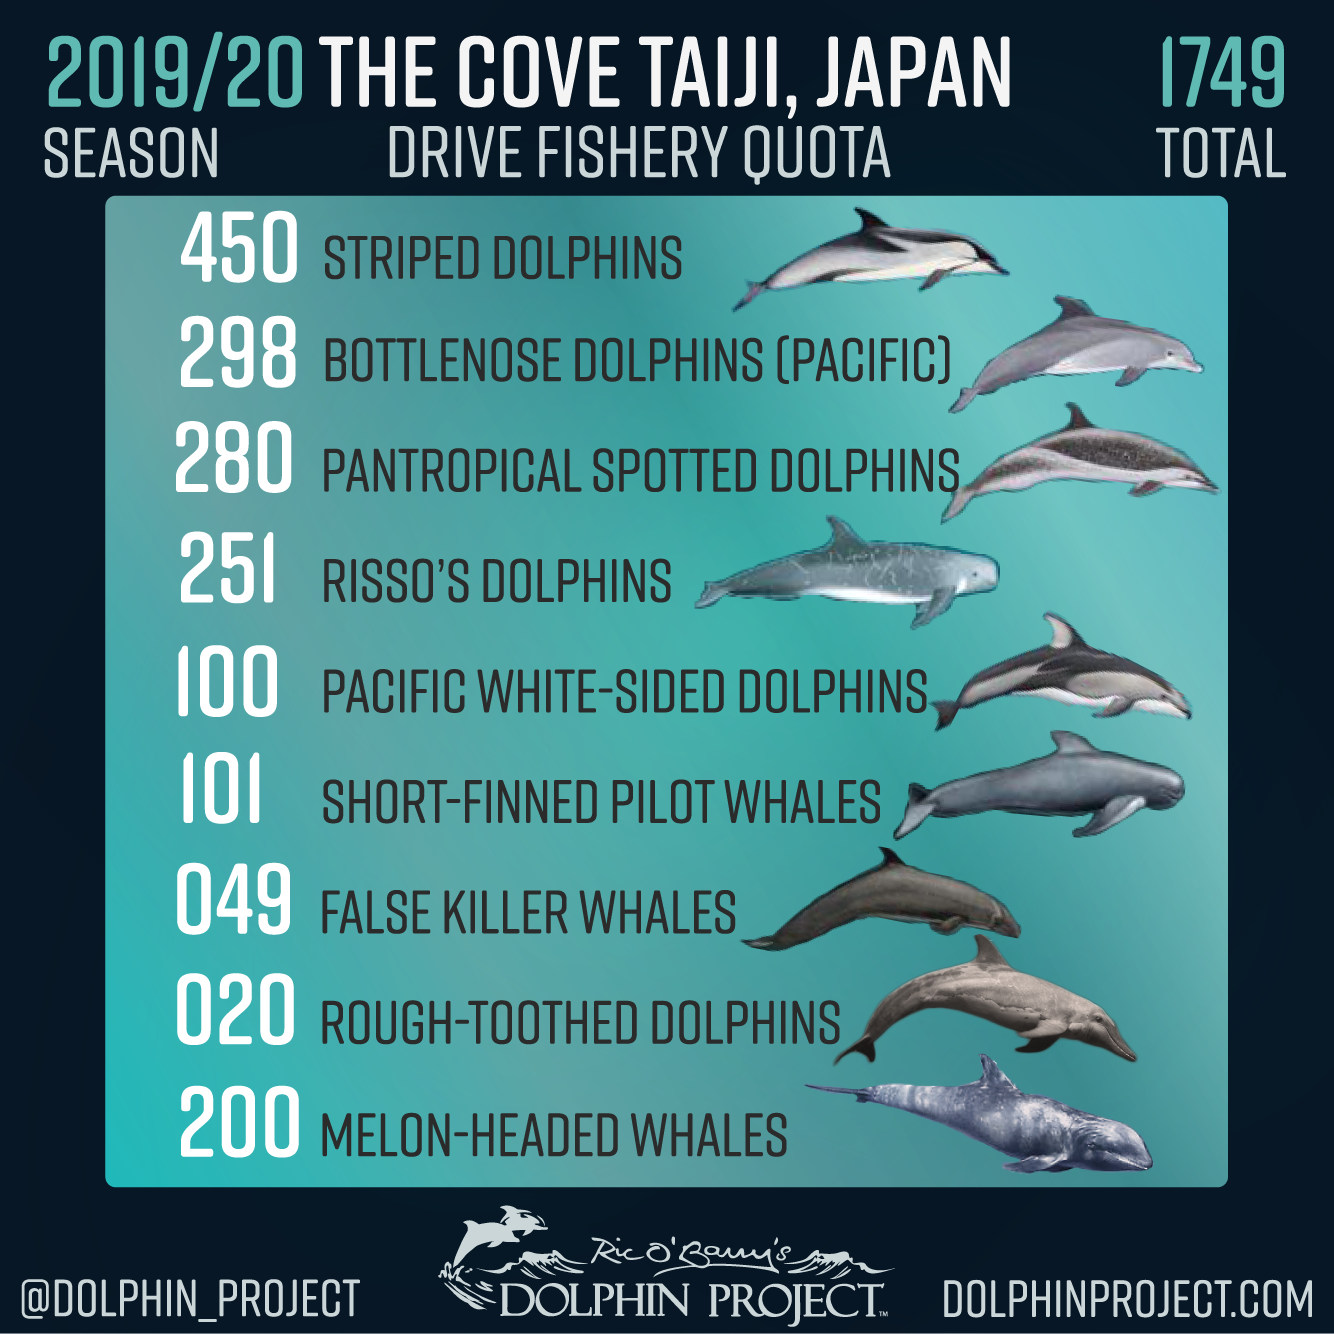 2019/20 Drive Fisheries Quota, Taiji, Japan